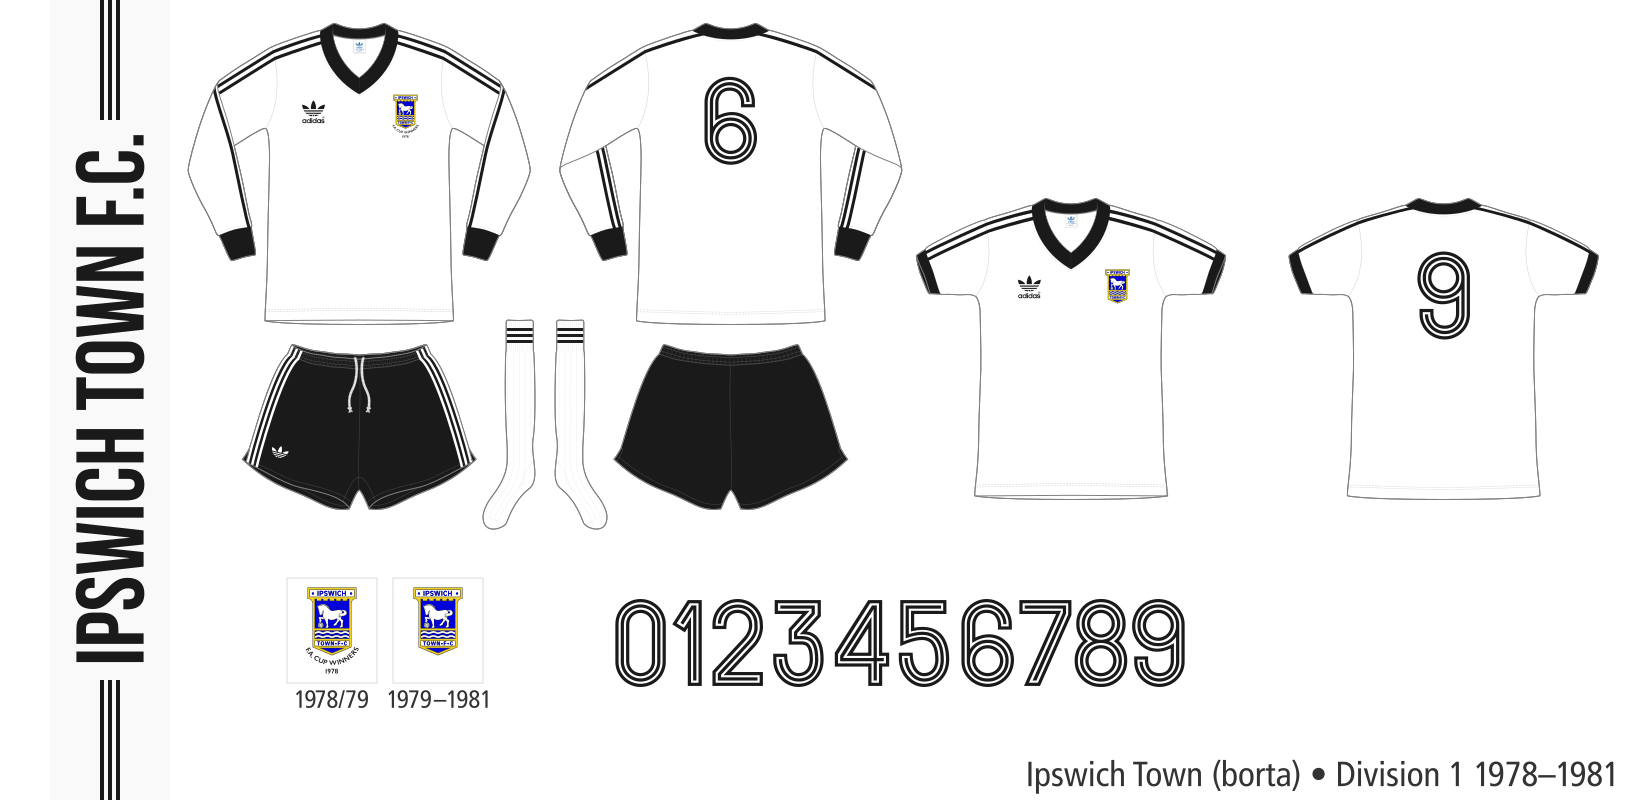 Ipswich Town 1978–1981 (borta)